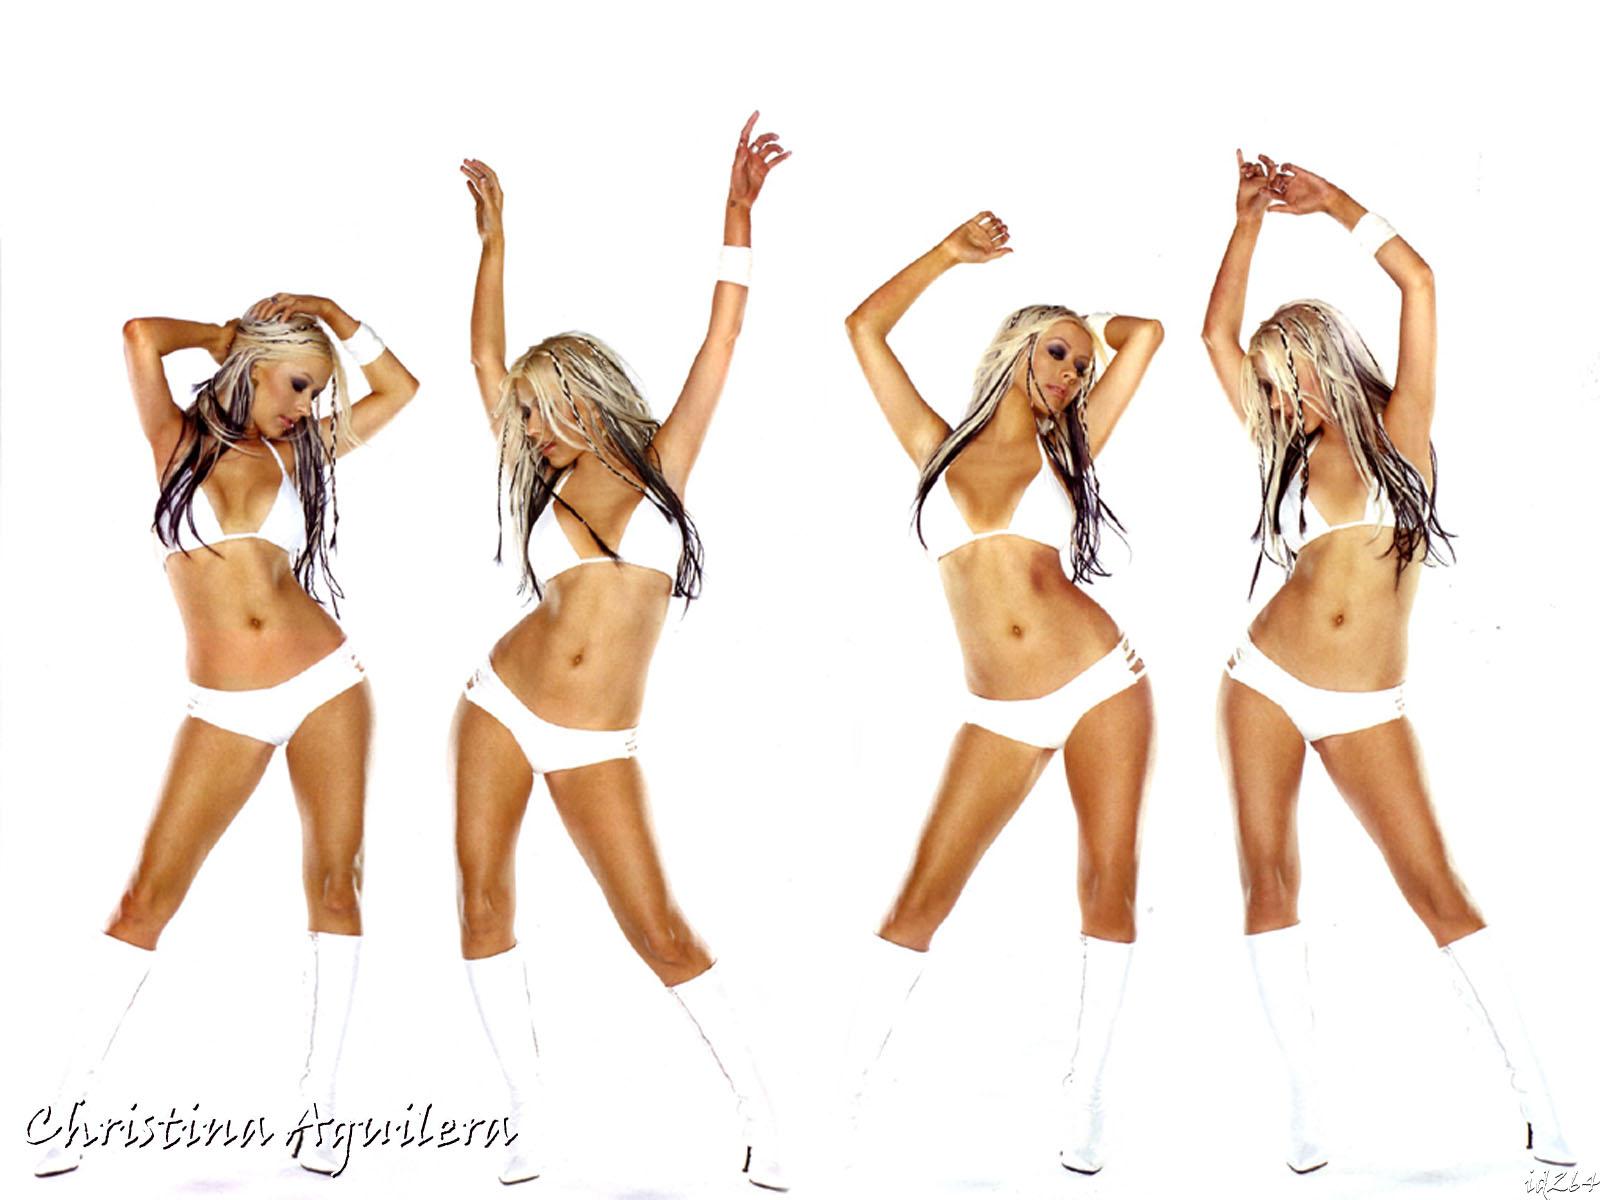 Wallpaper Christina Aguilera christina aguilera